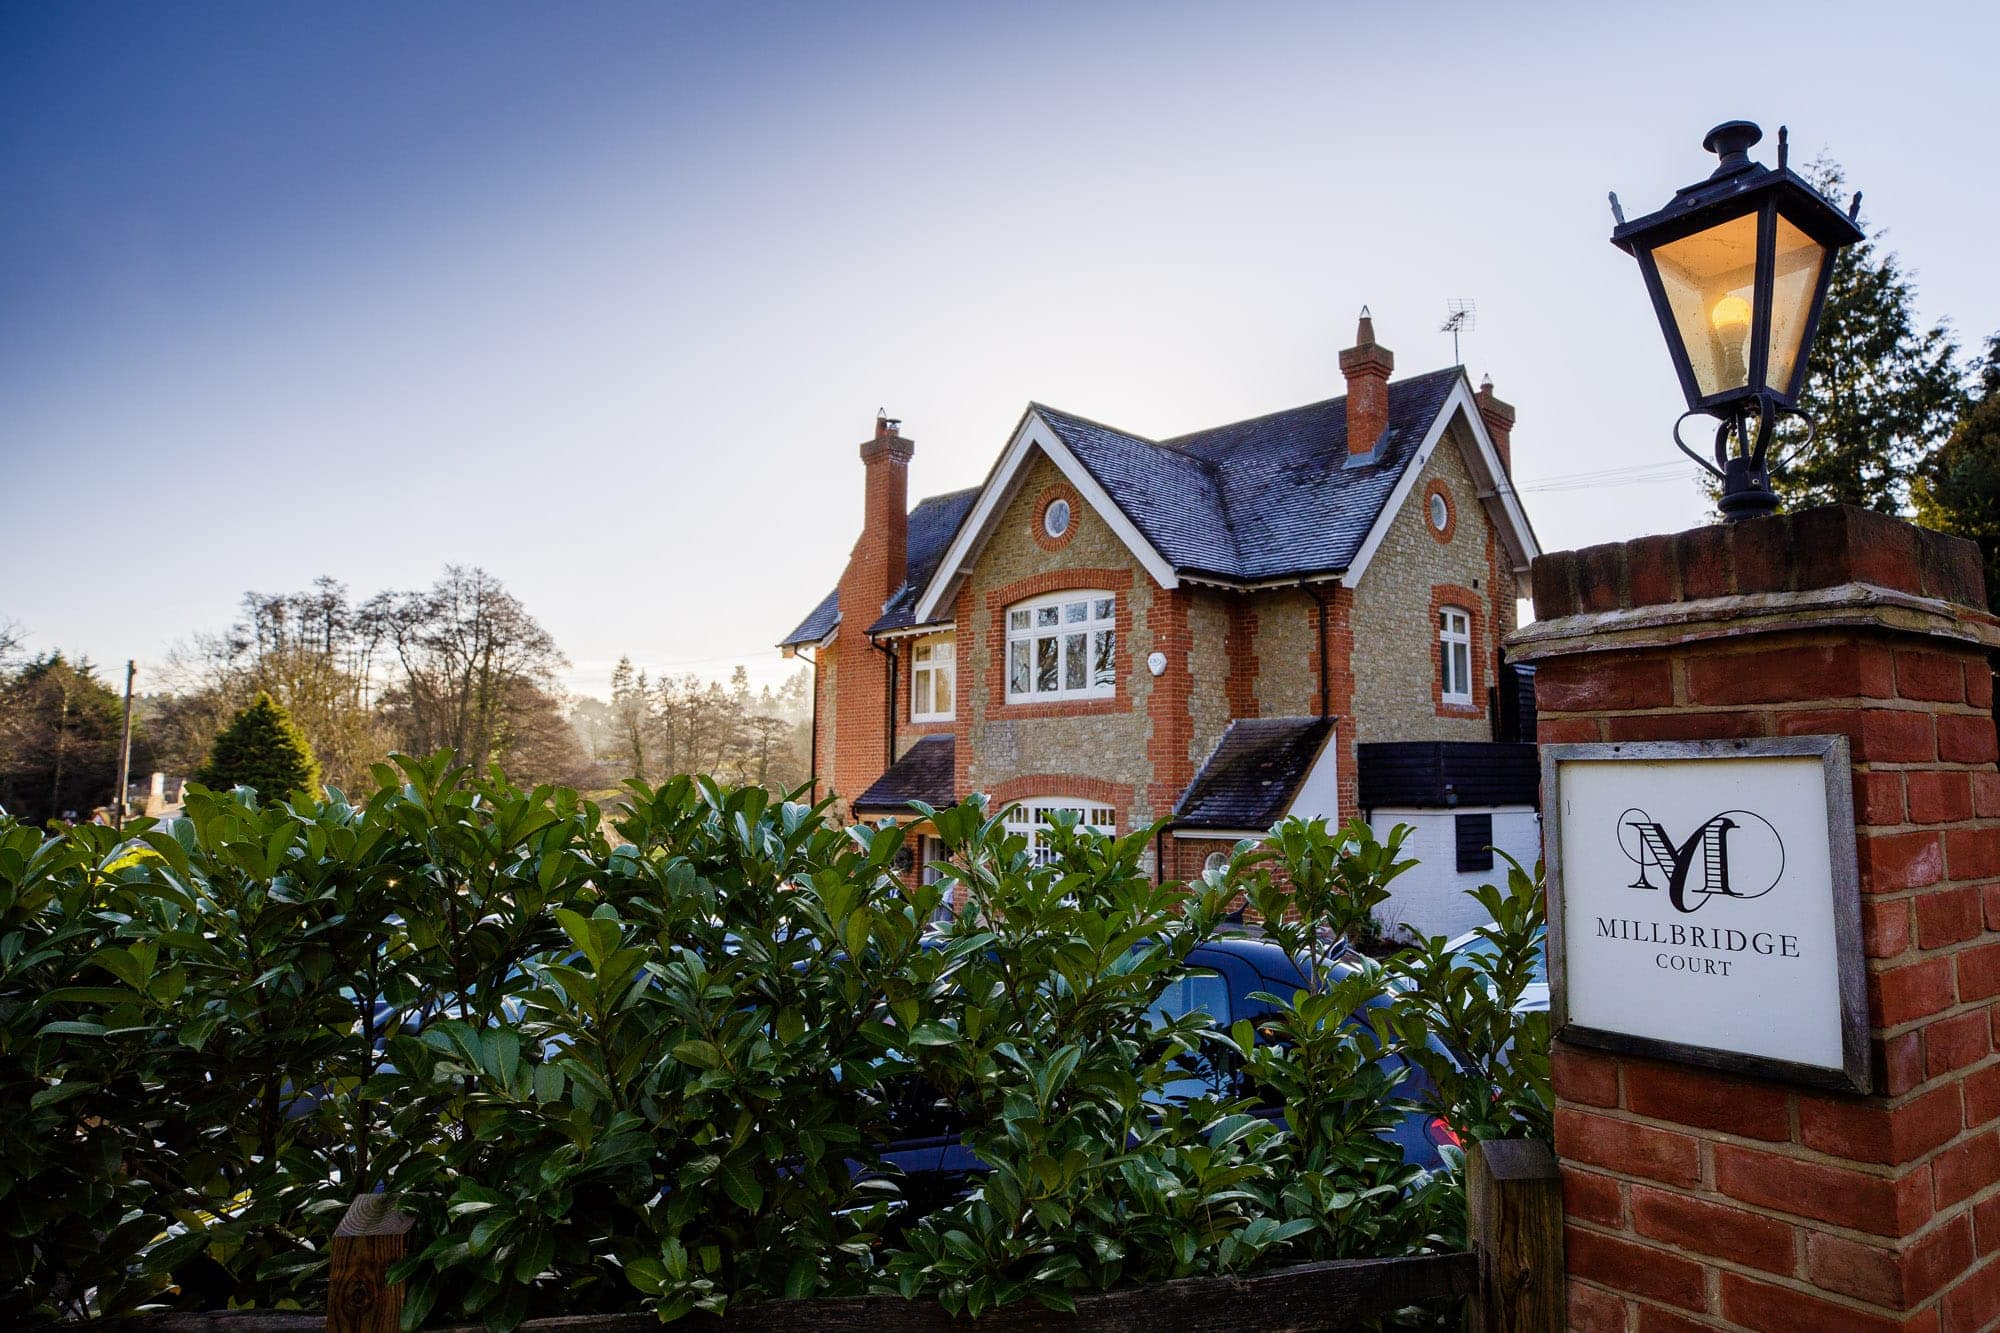 Millbridge Court Wedding Venue Surrey Farnham